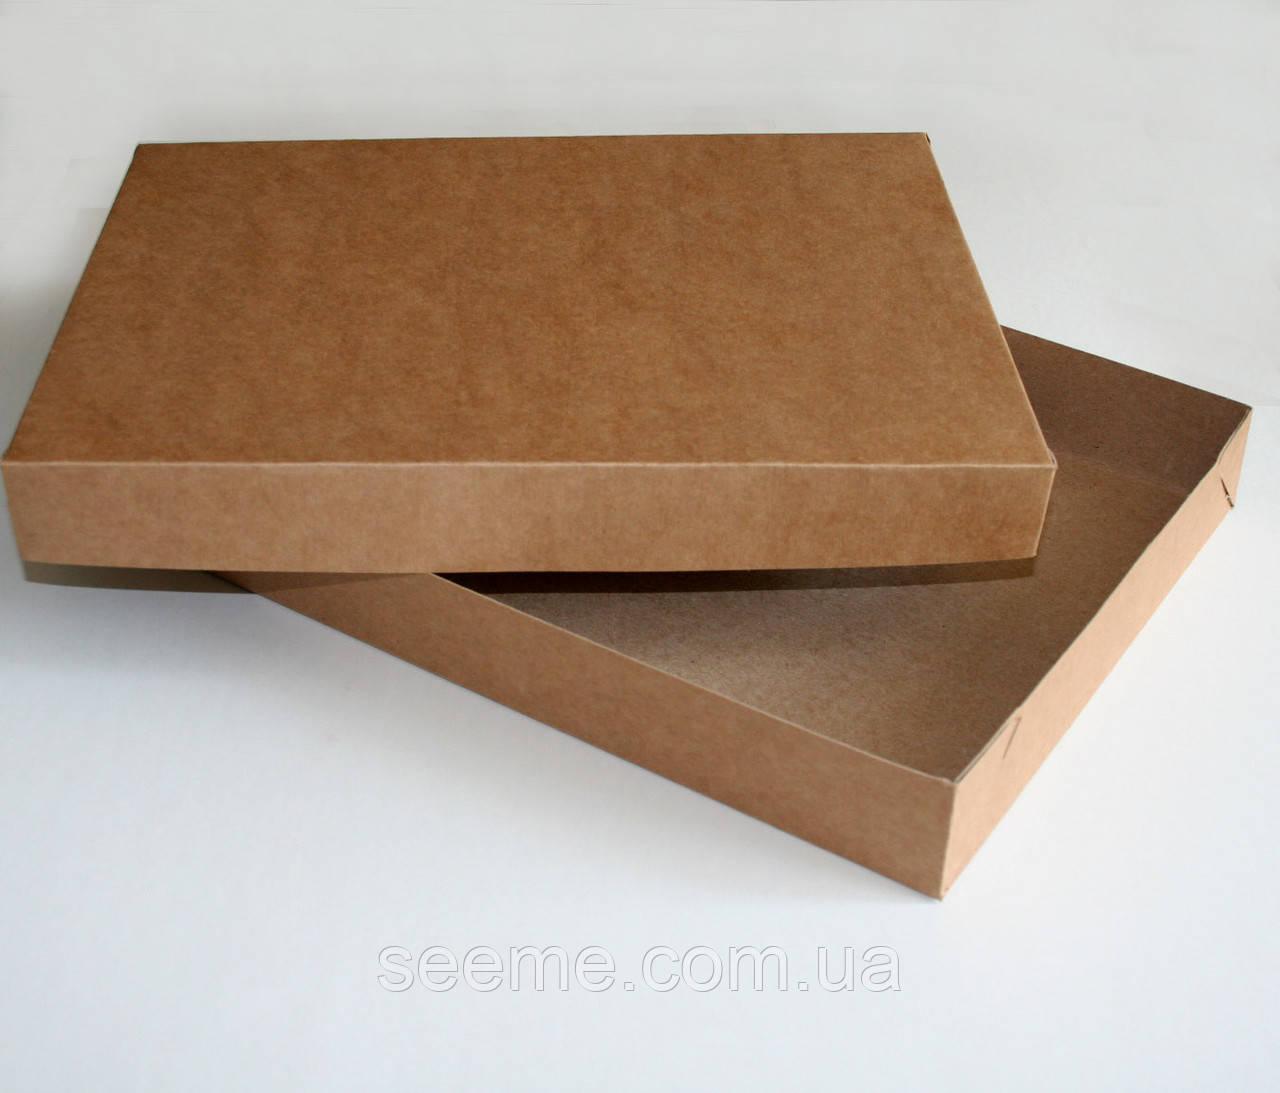 Коробка подарочная из крафт картона, 360х280х50 мм.